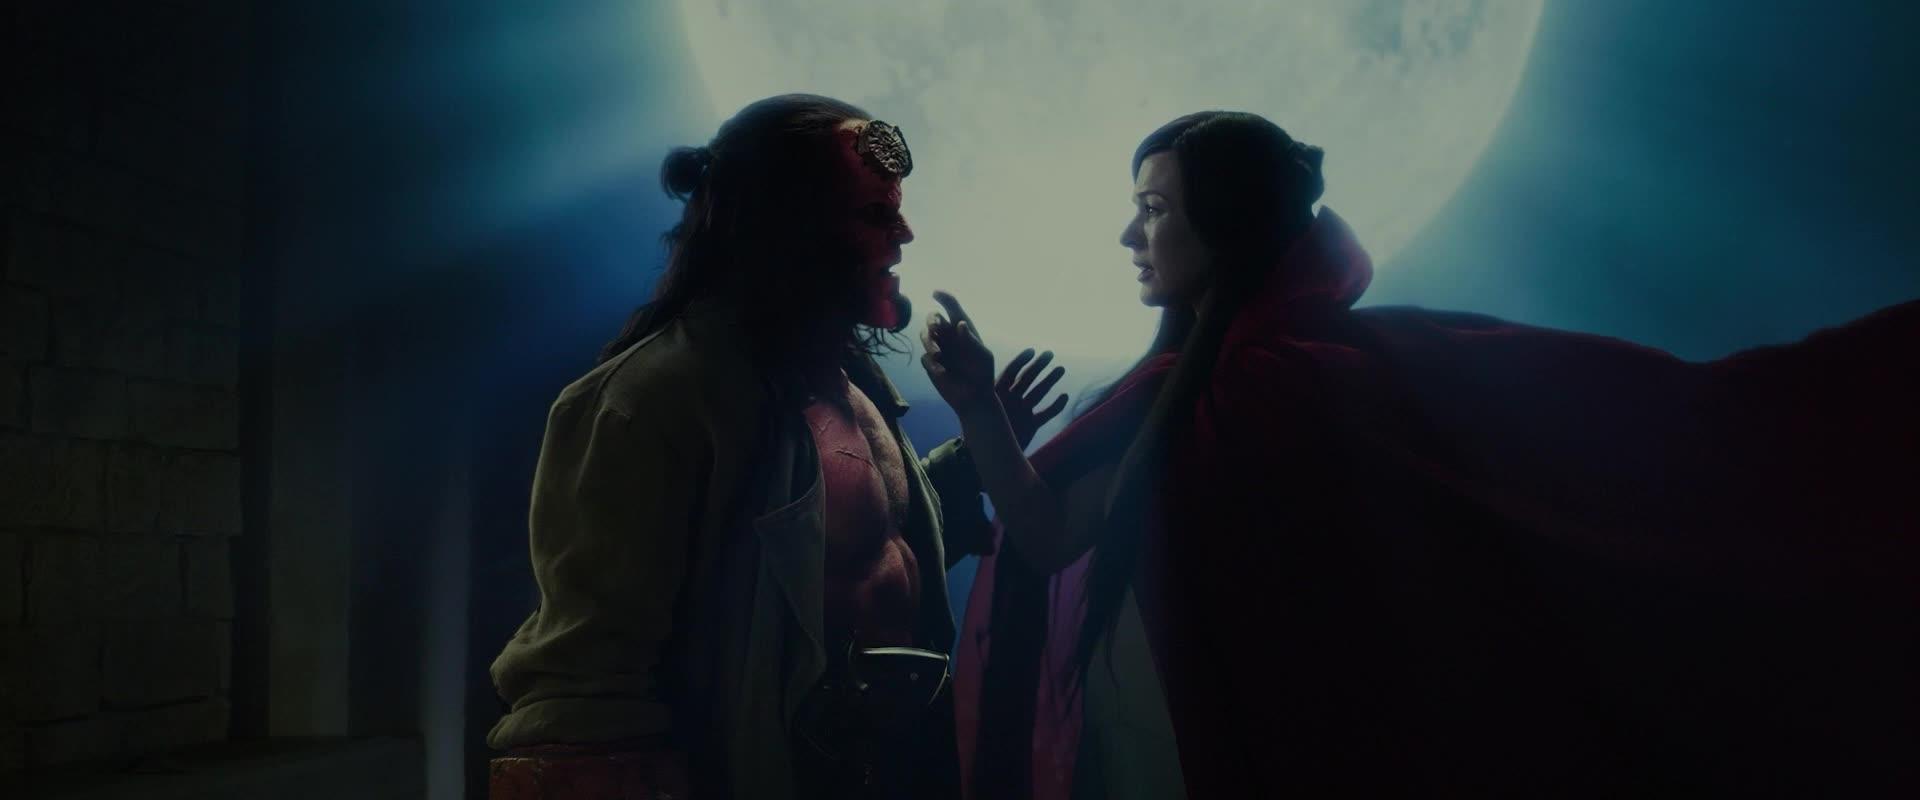 dark horse, dark horse comics, david harbour, hellboy, hellboy 2019, hellboy movie, i love u, i love you, love, love you, milla jovovich, superhero, superheroes, Hellboy Nimue Love GIFs